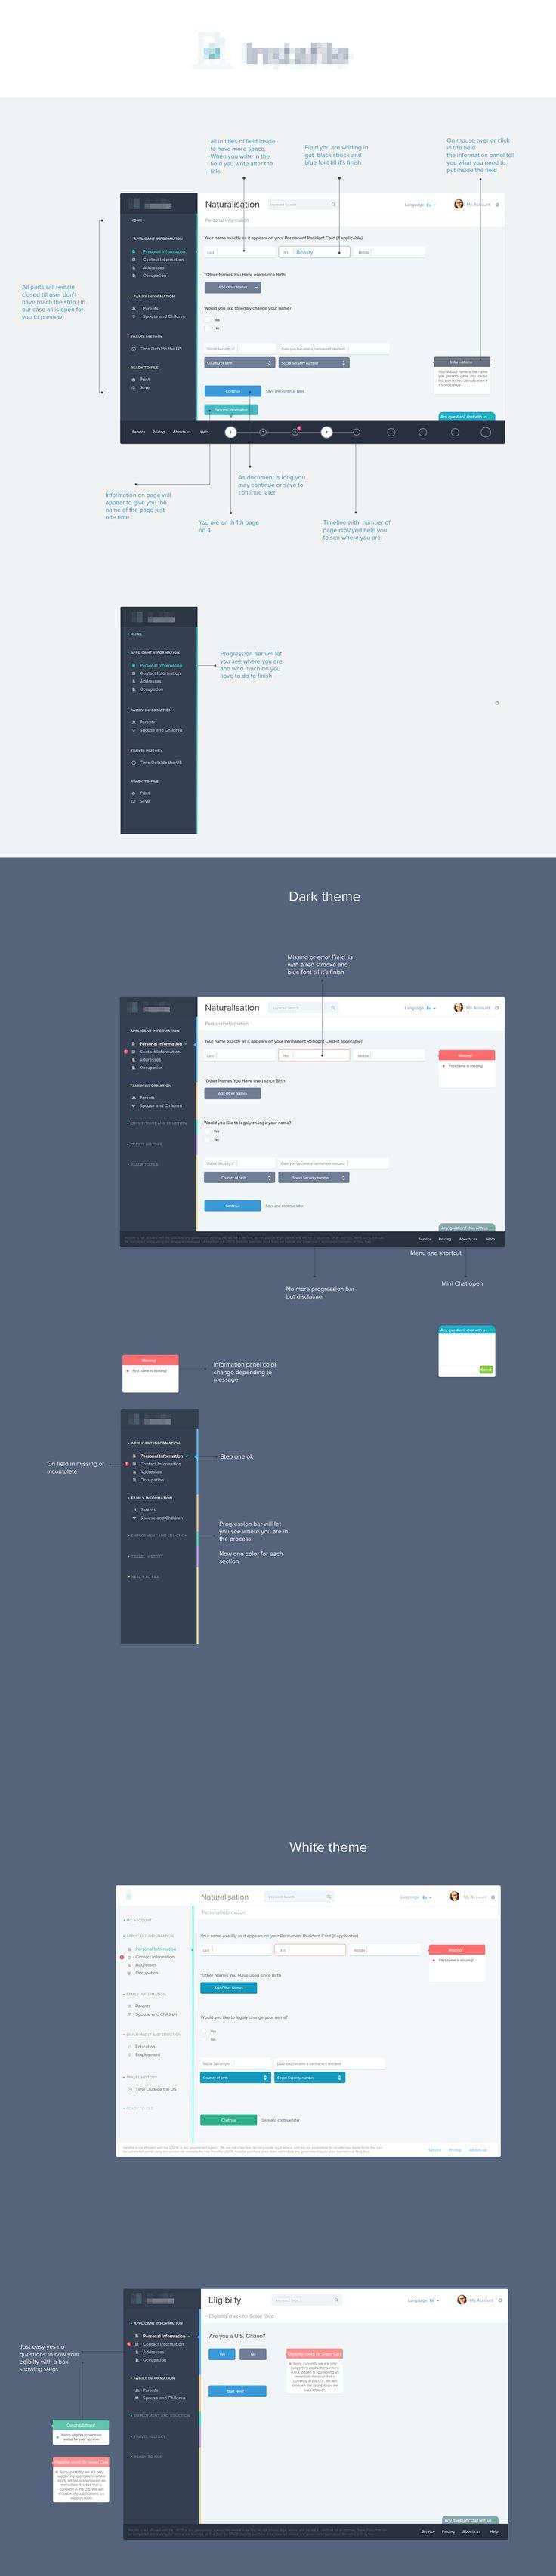 Dribbble social app ui design jpg by ramotion - Allscreens Dashboard Designweb Dashboardui